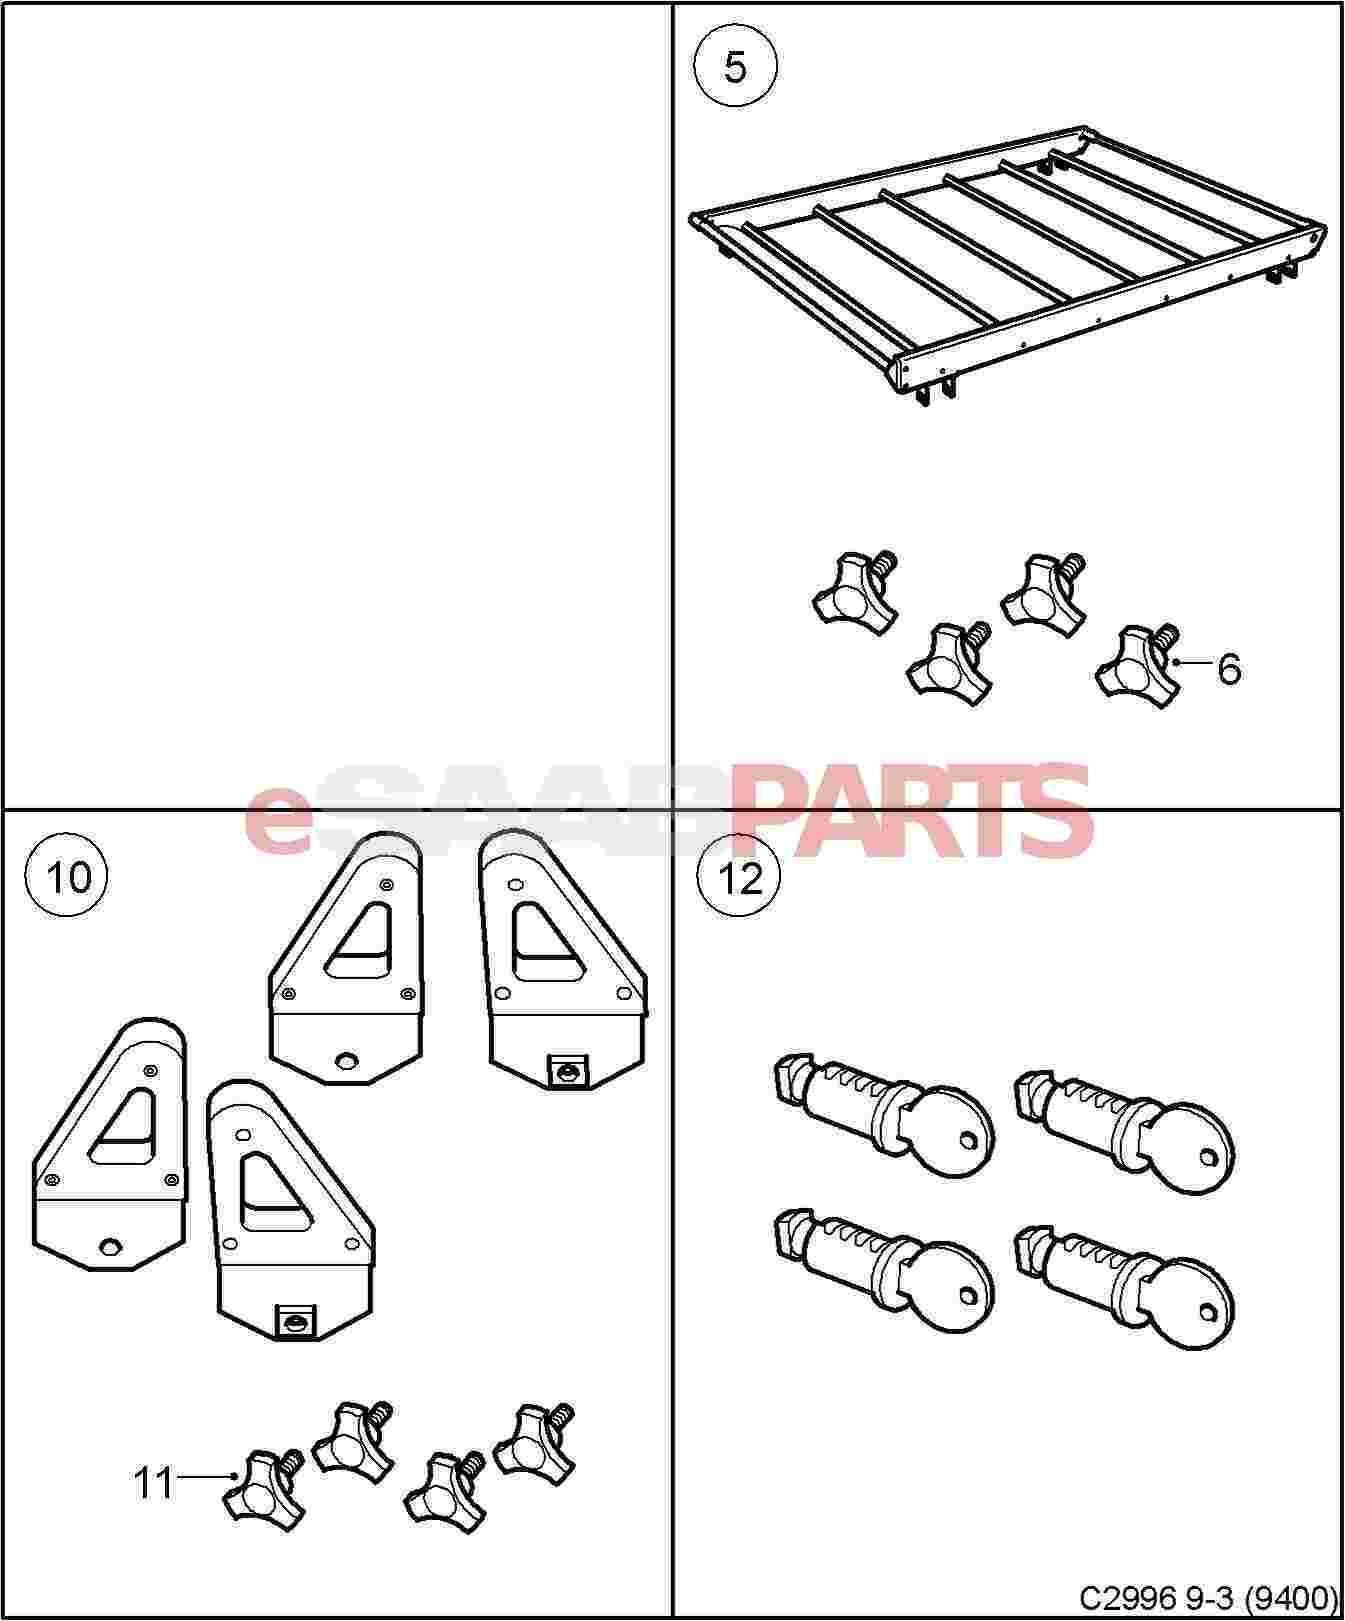 2011 Camaro V6 Turbo Kit | Wiring Diagram Database